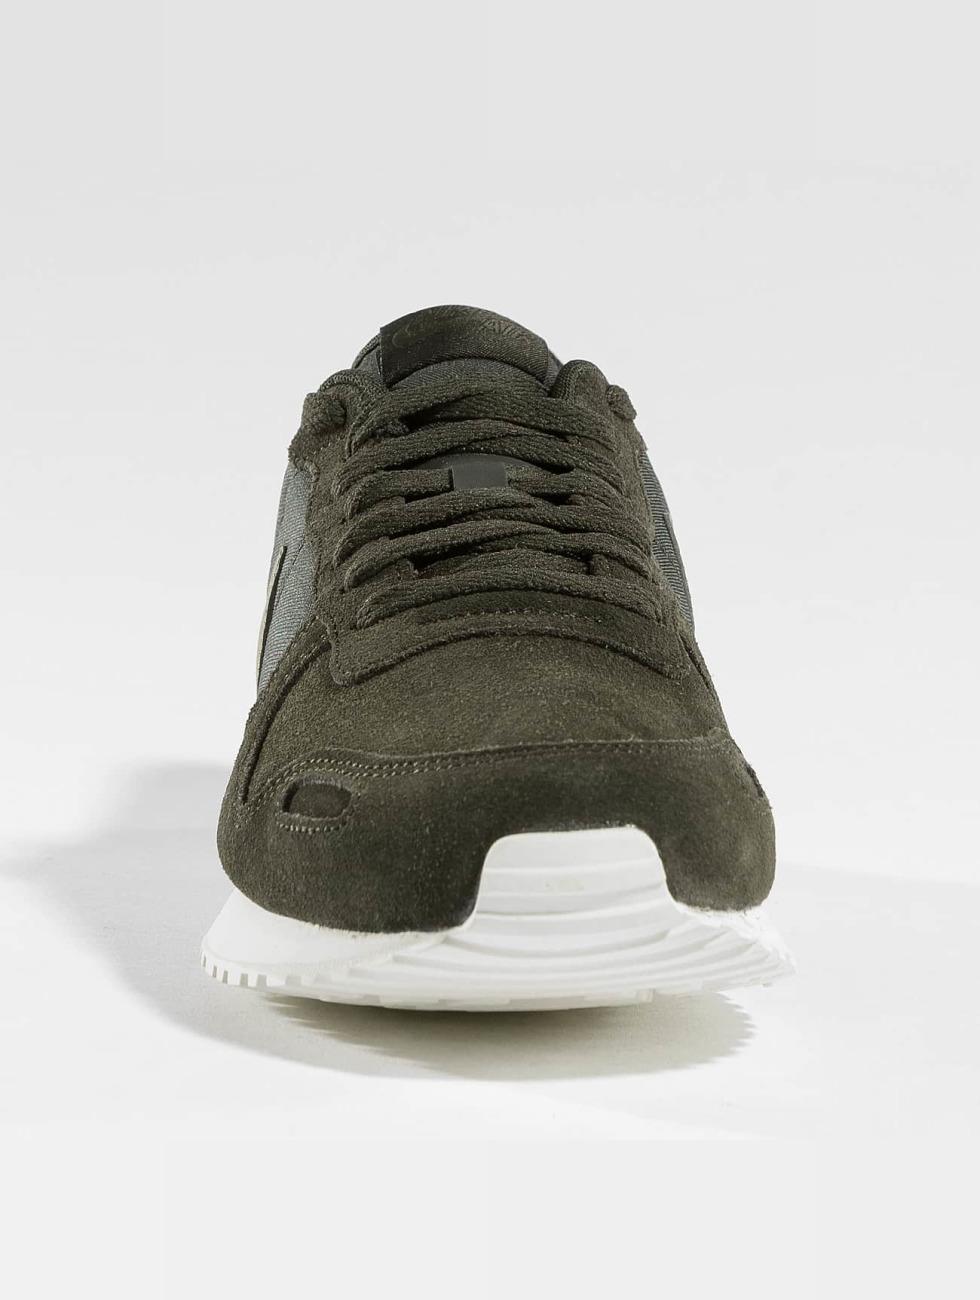 Nike Scarpa / Sneaker Vortice D'aria A Oliva 422.407 YtZDVl7M